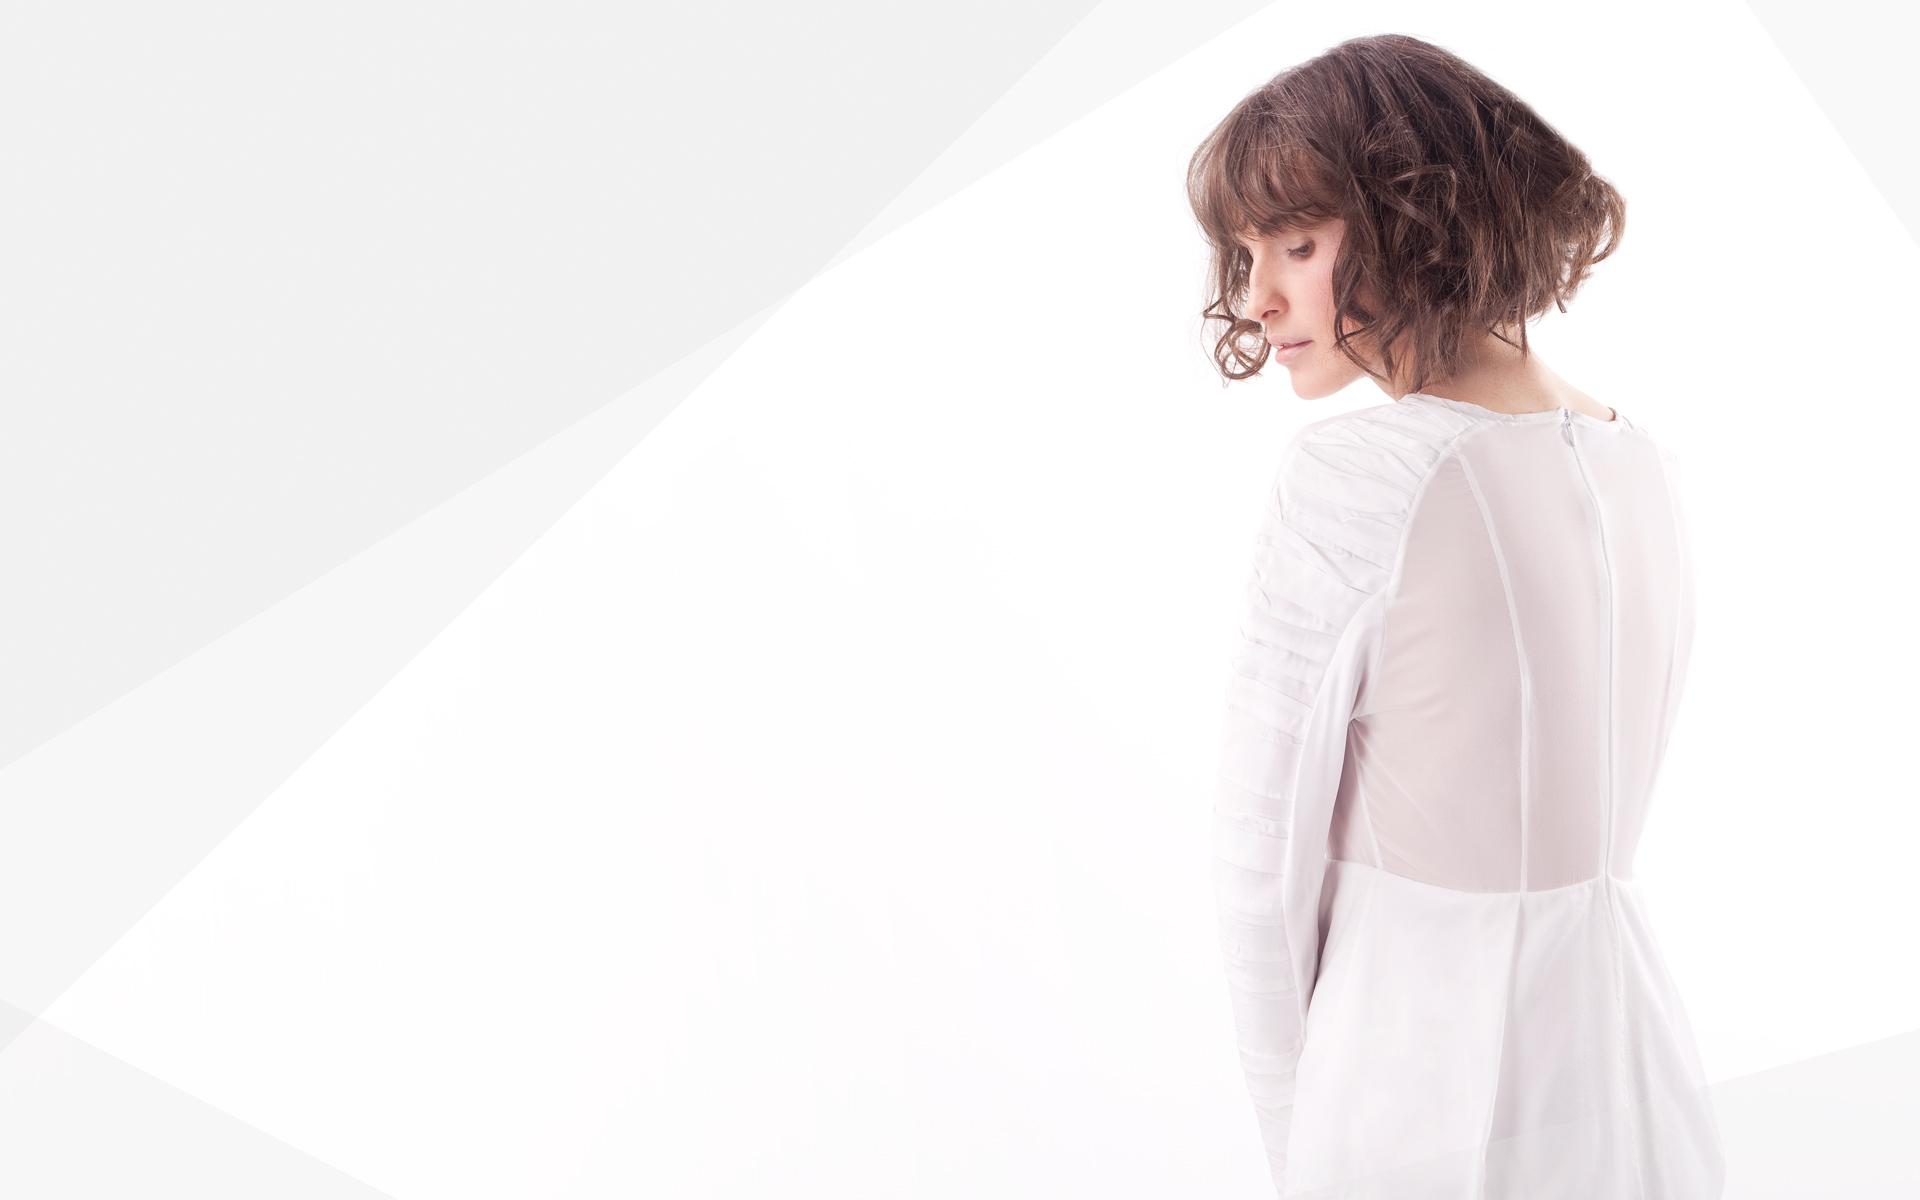 081_Fashion_F.Roncaldier